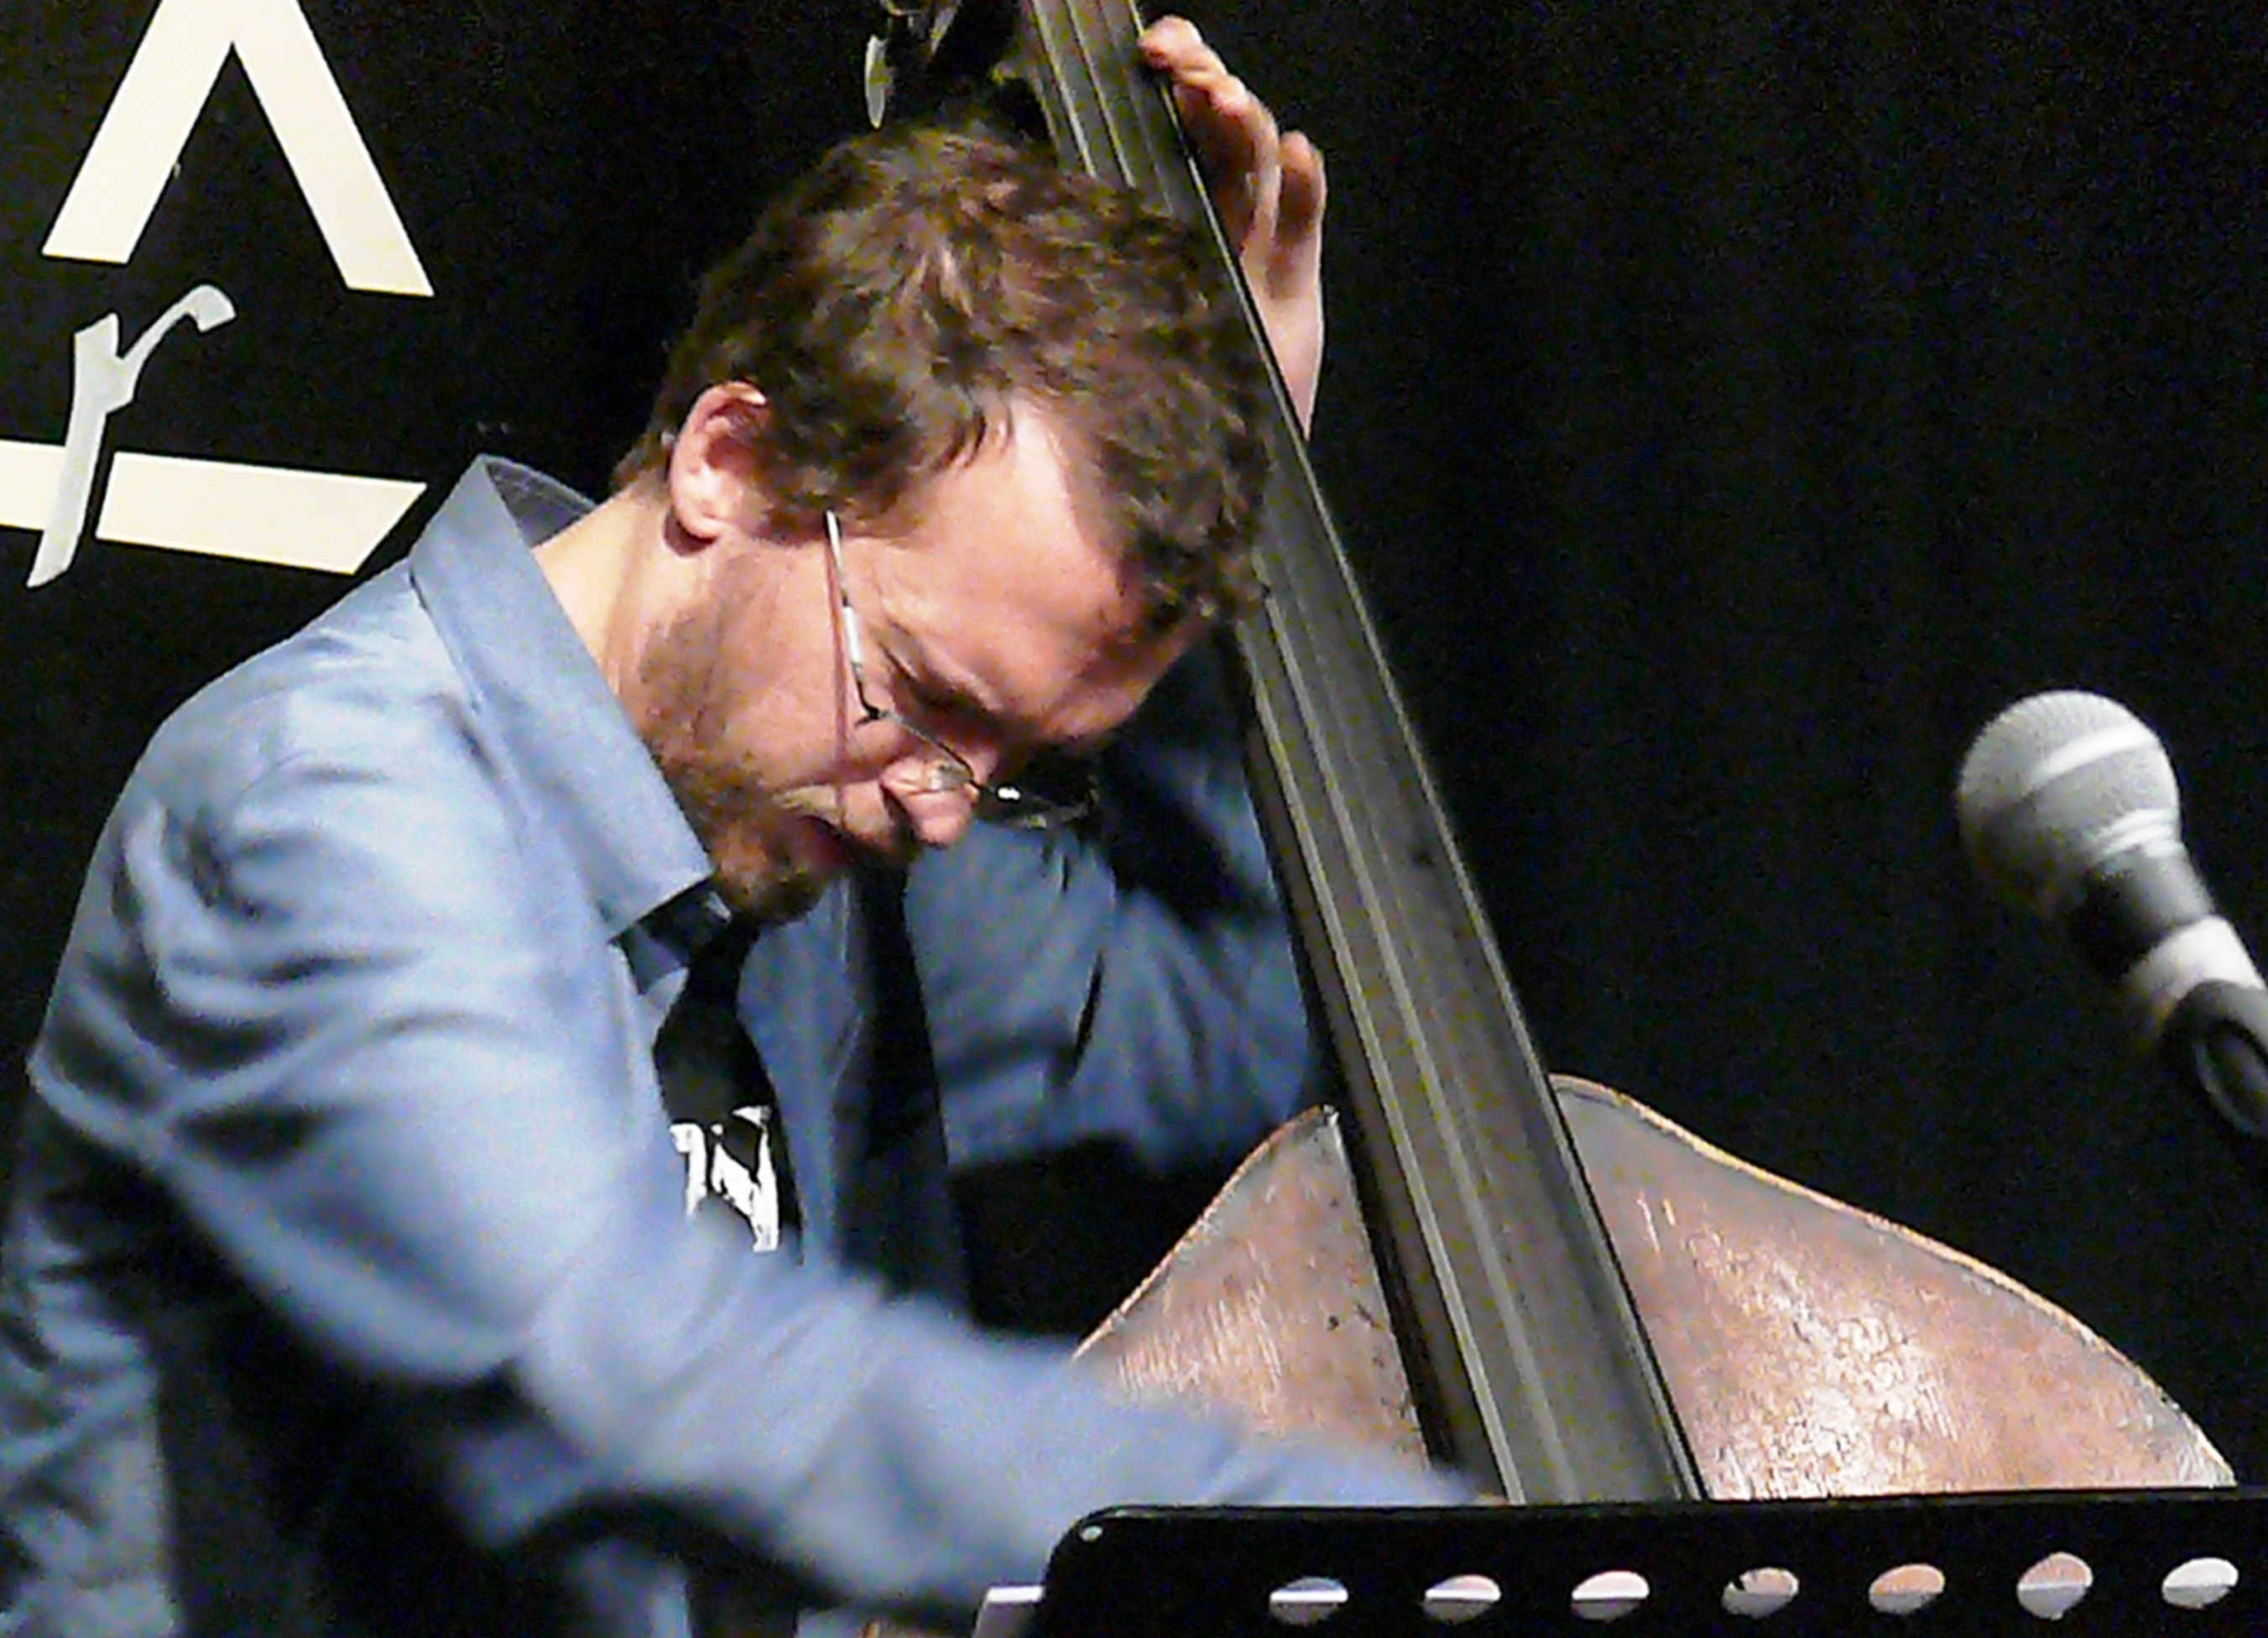 Dominic lash at the vortex, london in october 2013